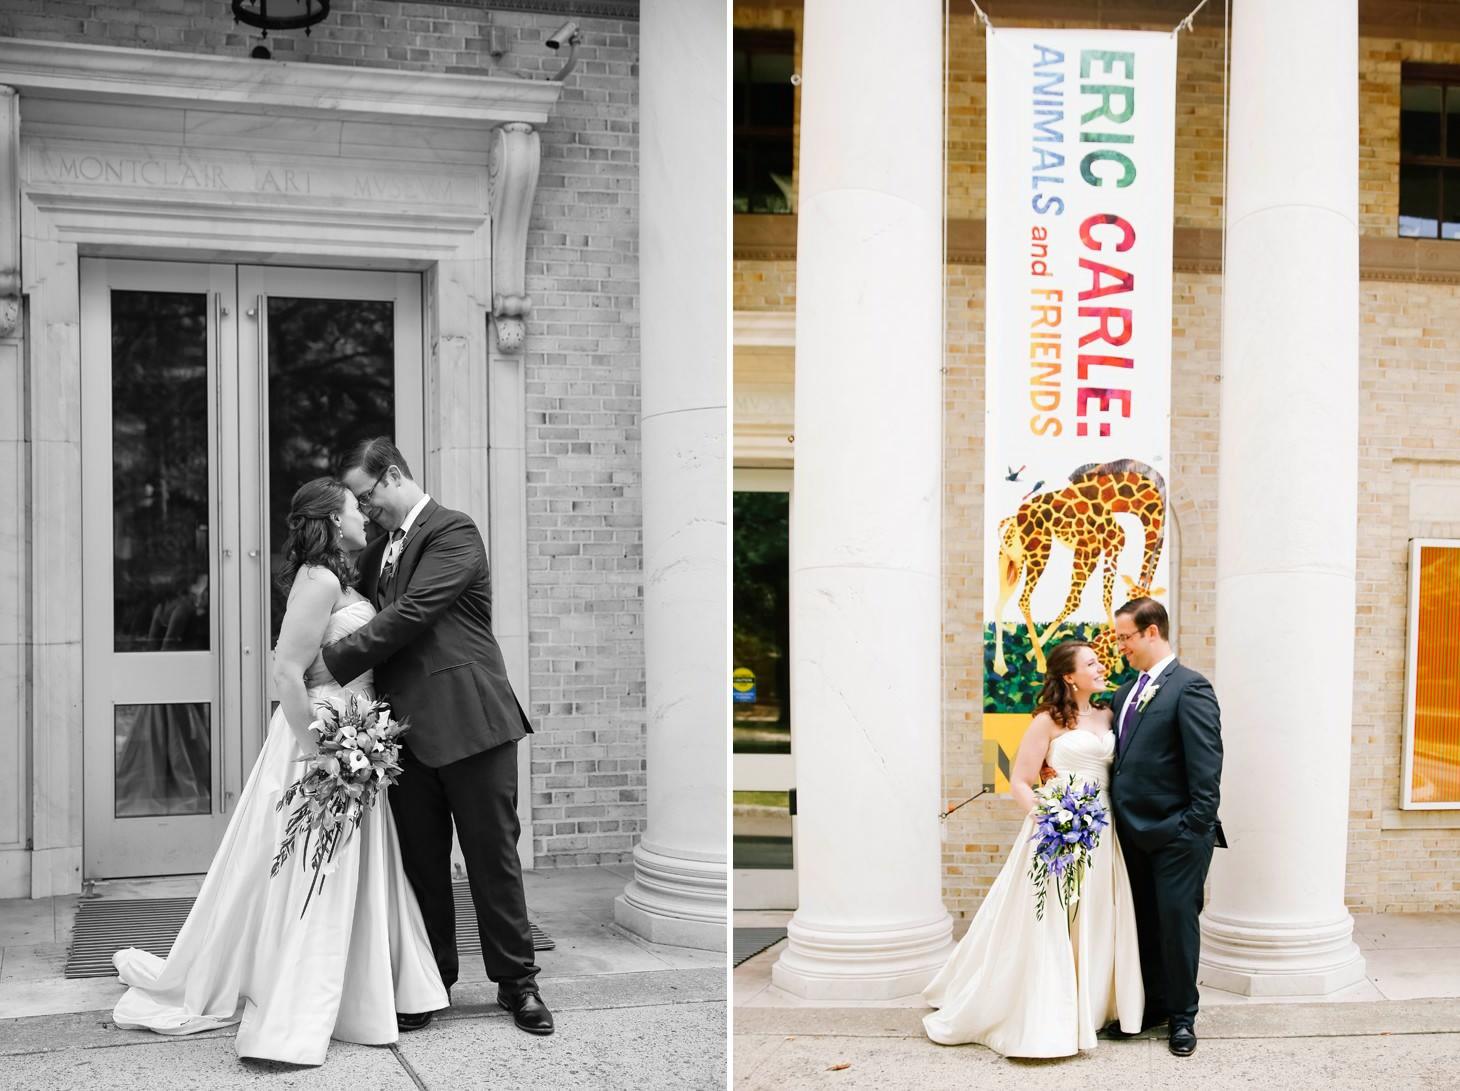 046-nyc-wedding-photographer-hoboken-waterfront-wedding-photos-smitten-chickens.jpg